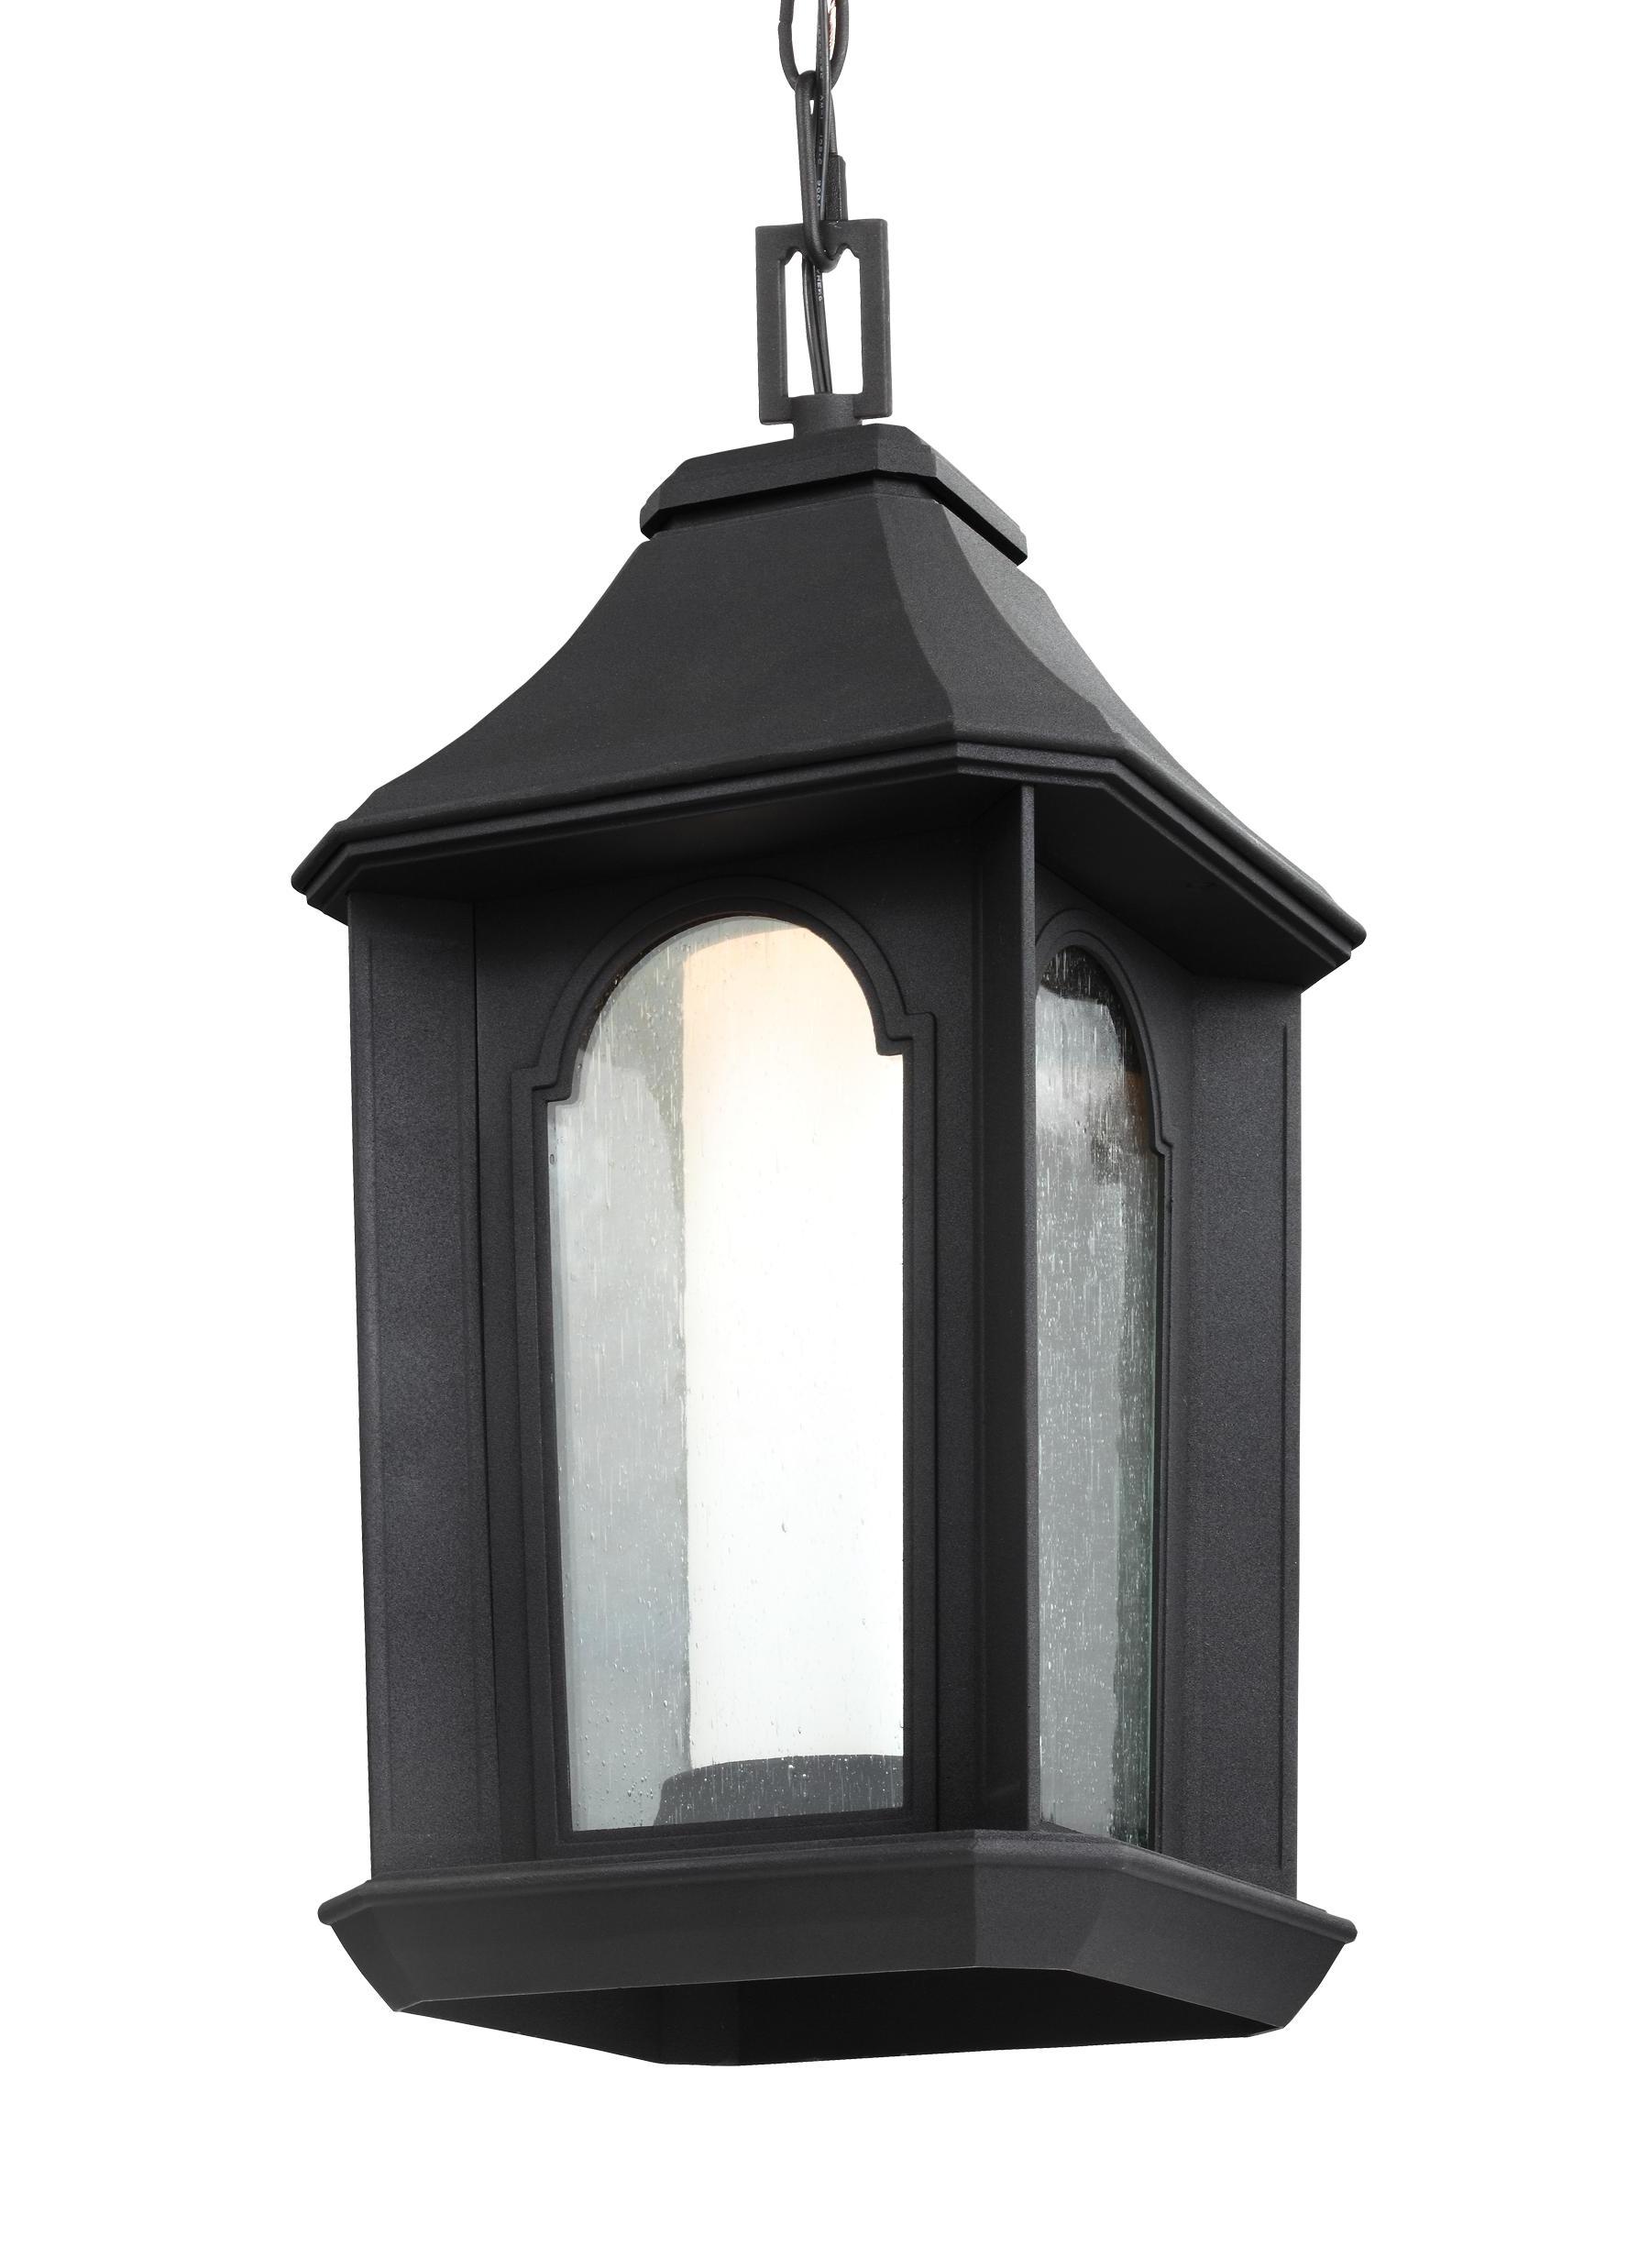 Outdoor Gazebo Lanterns With Preferred Ol11509Txb Led,1 – Light Outdoor Led Pendant Lantern,textured Black (Gallery 12 of 20)